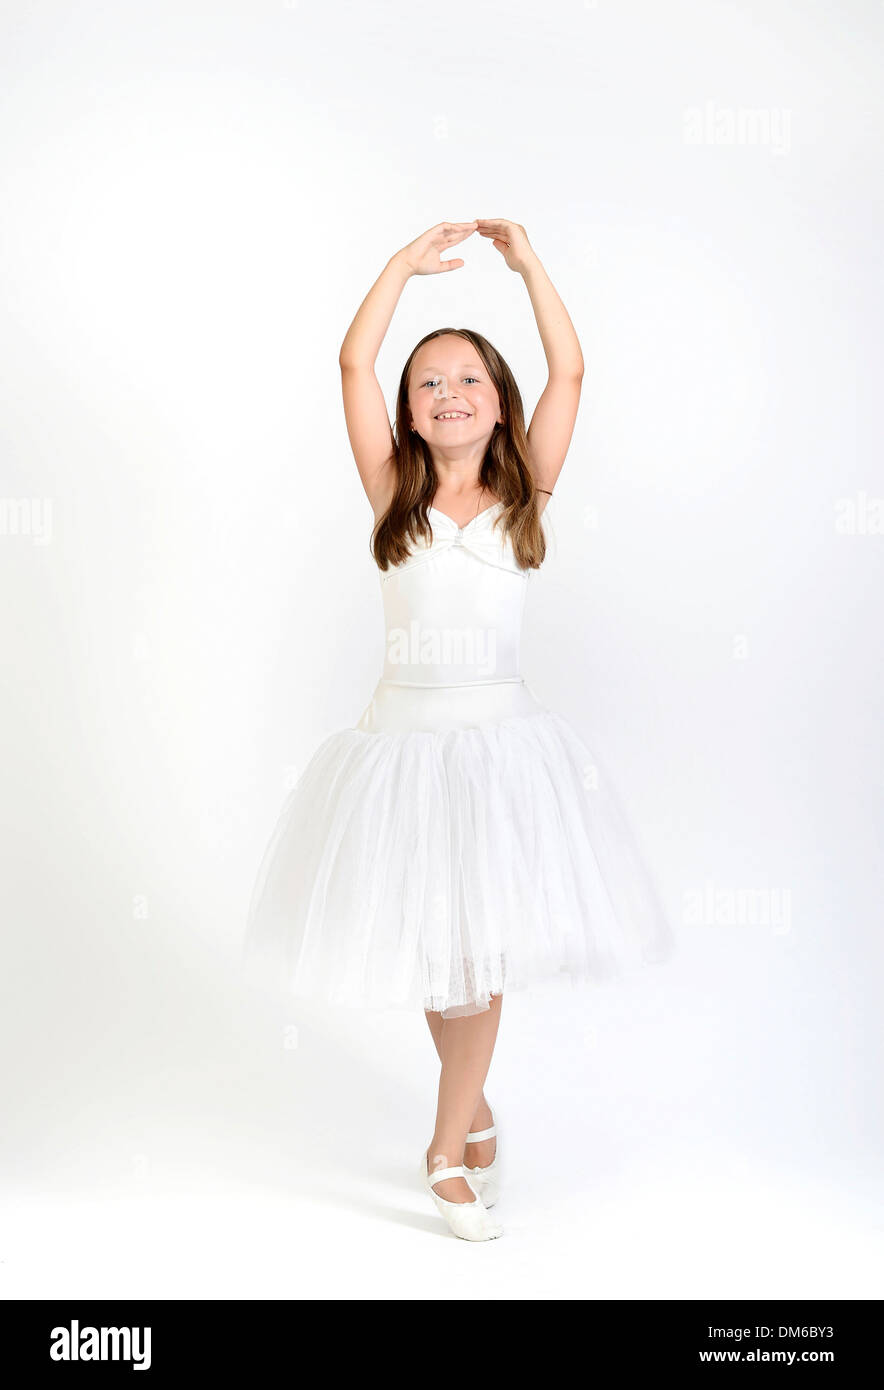 Young ballerina wearing a tutu Stock Photo